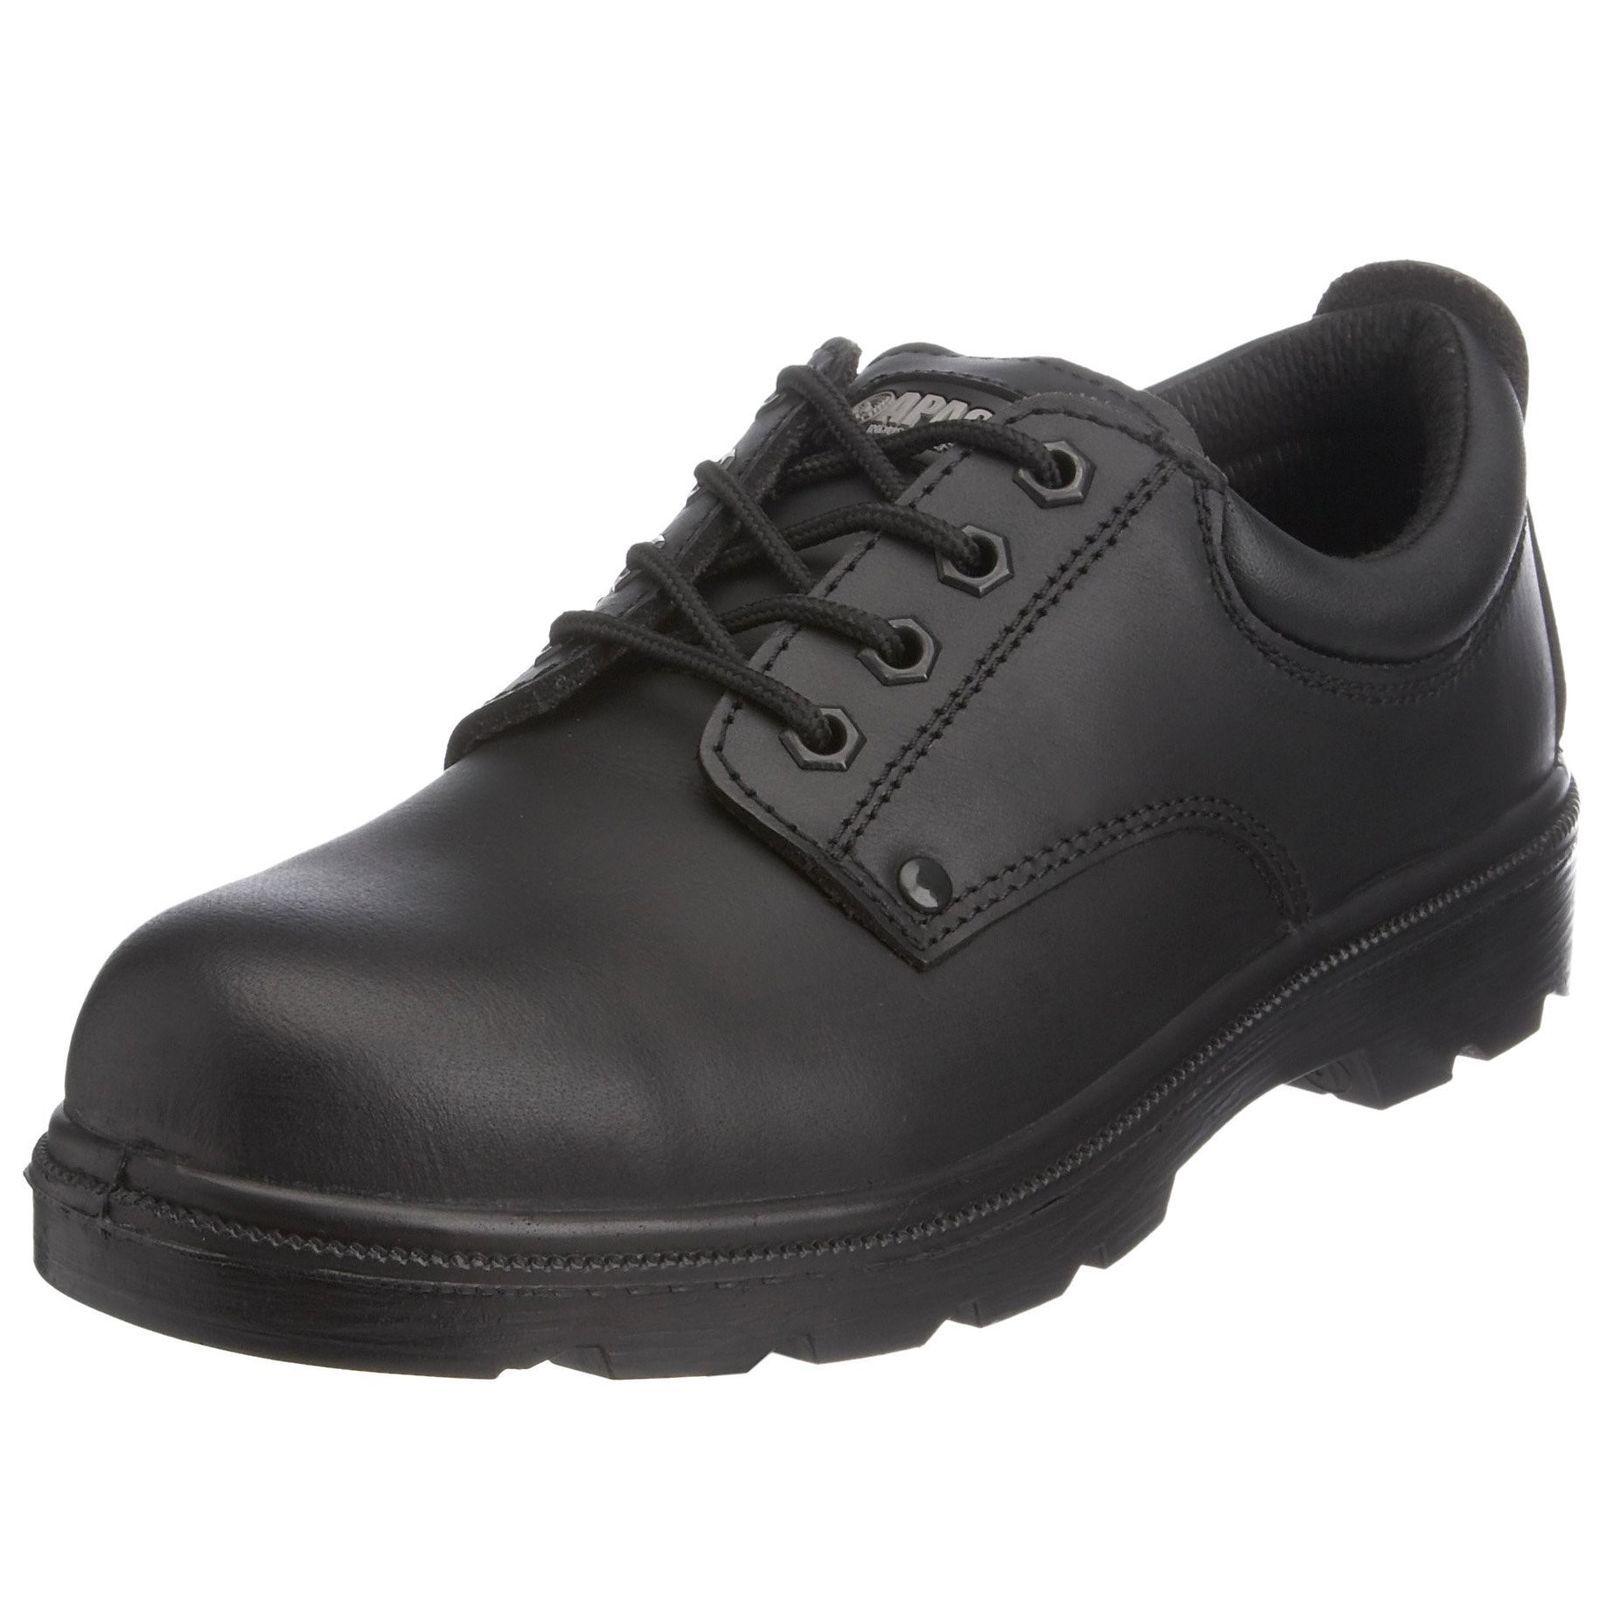 Blackrock tomahawk boot-couleur : noir-taille 6  39 (Taille Fabricant: 6)  36 EU(3.5 UK)  44 EU  Mocassins Femme  39 EU dCVu3zeS